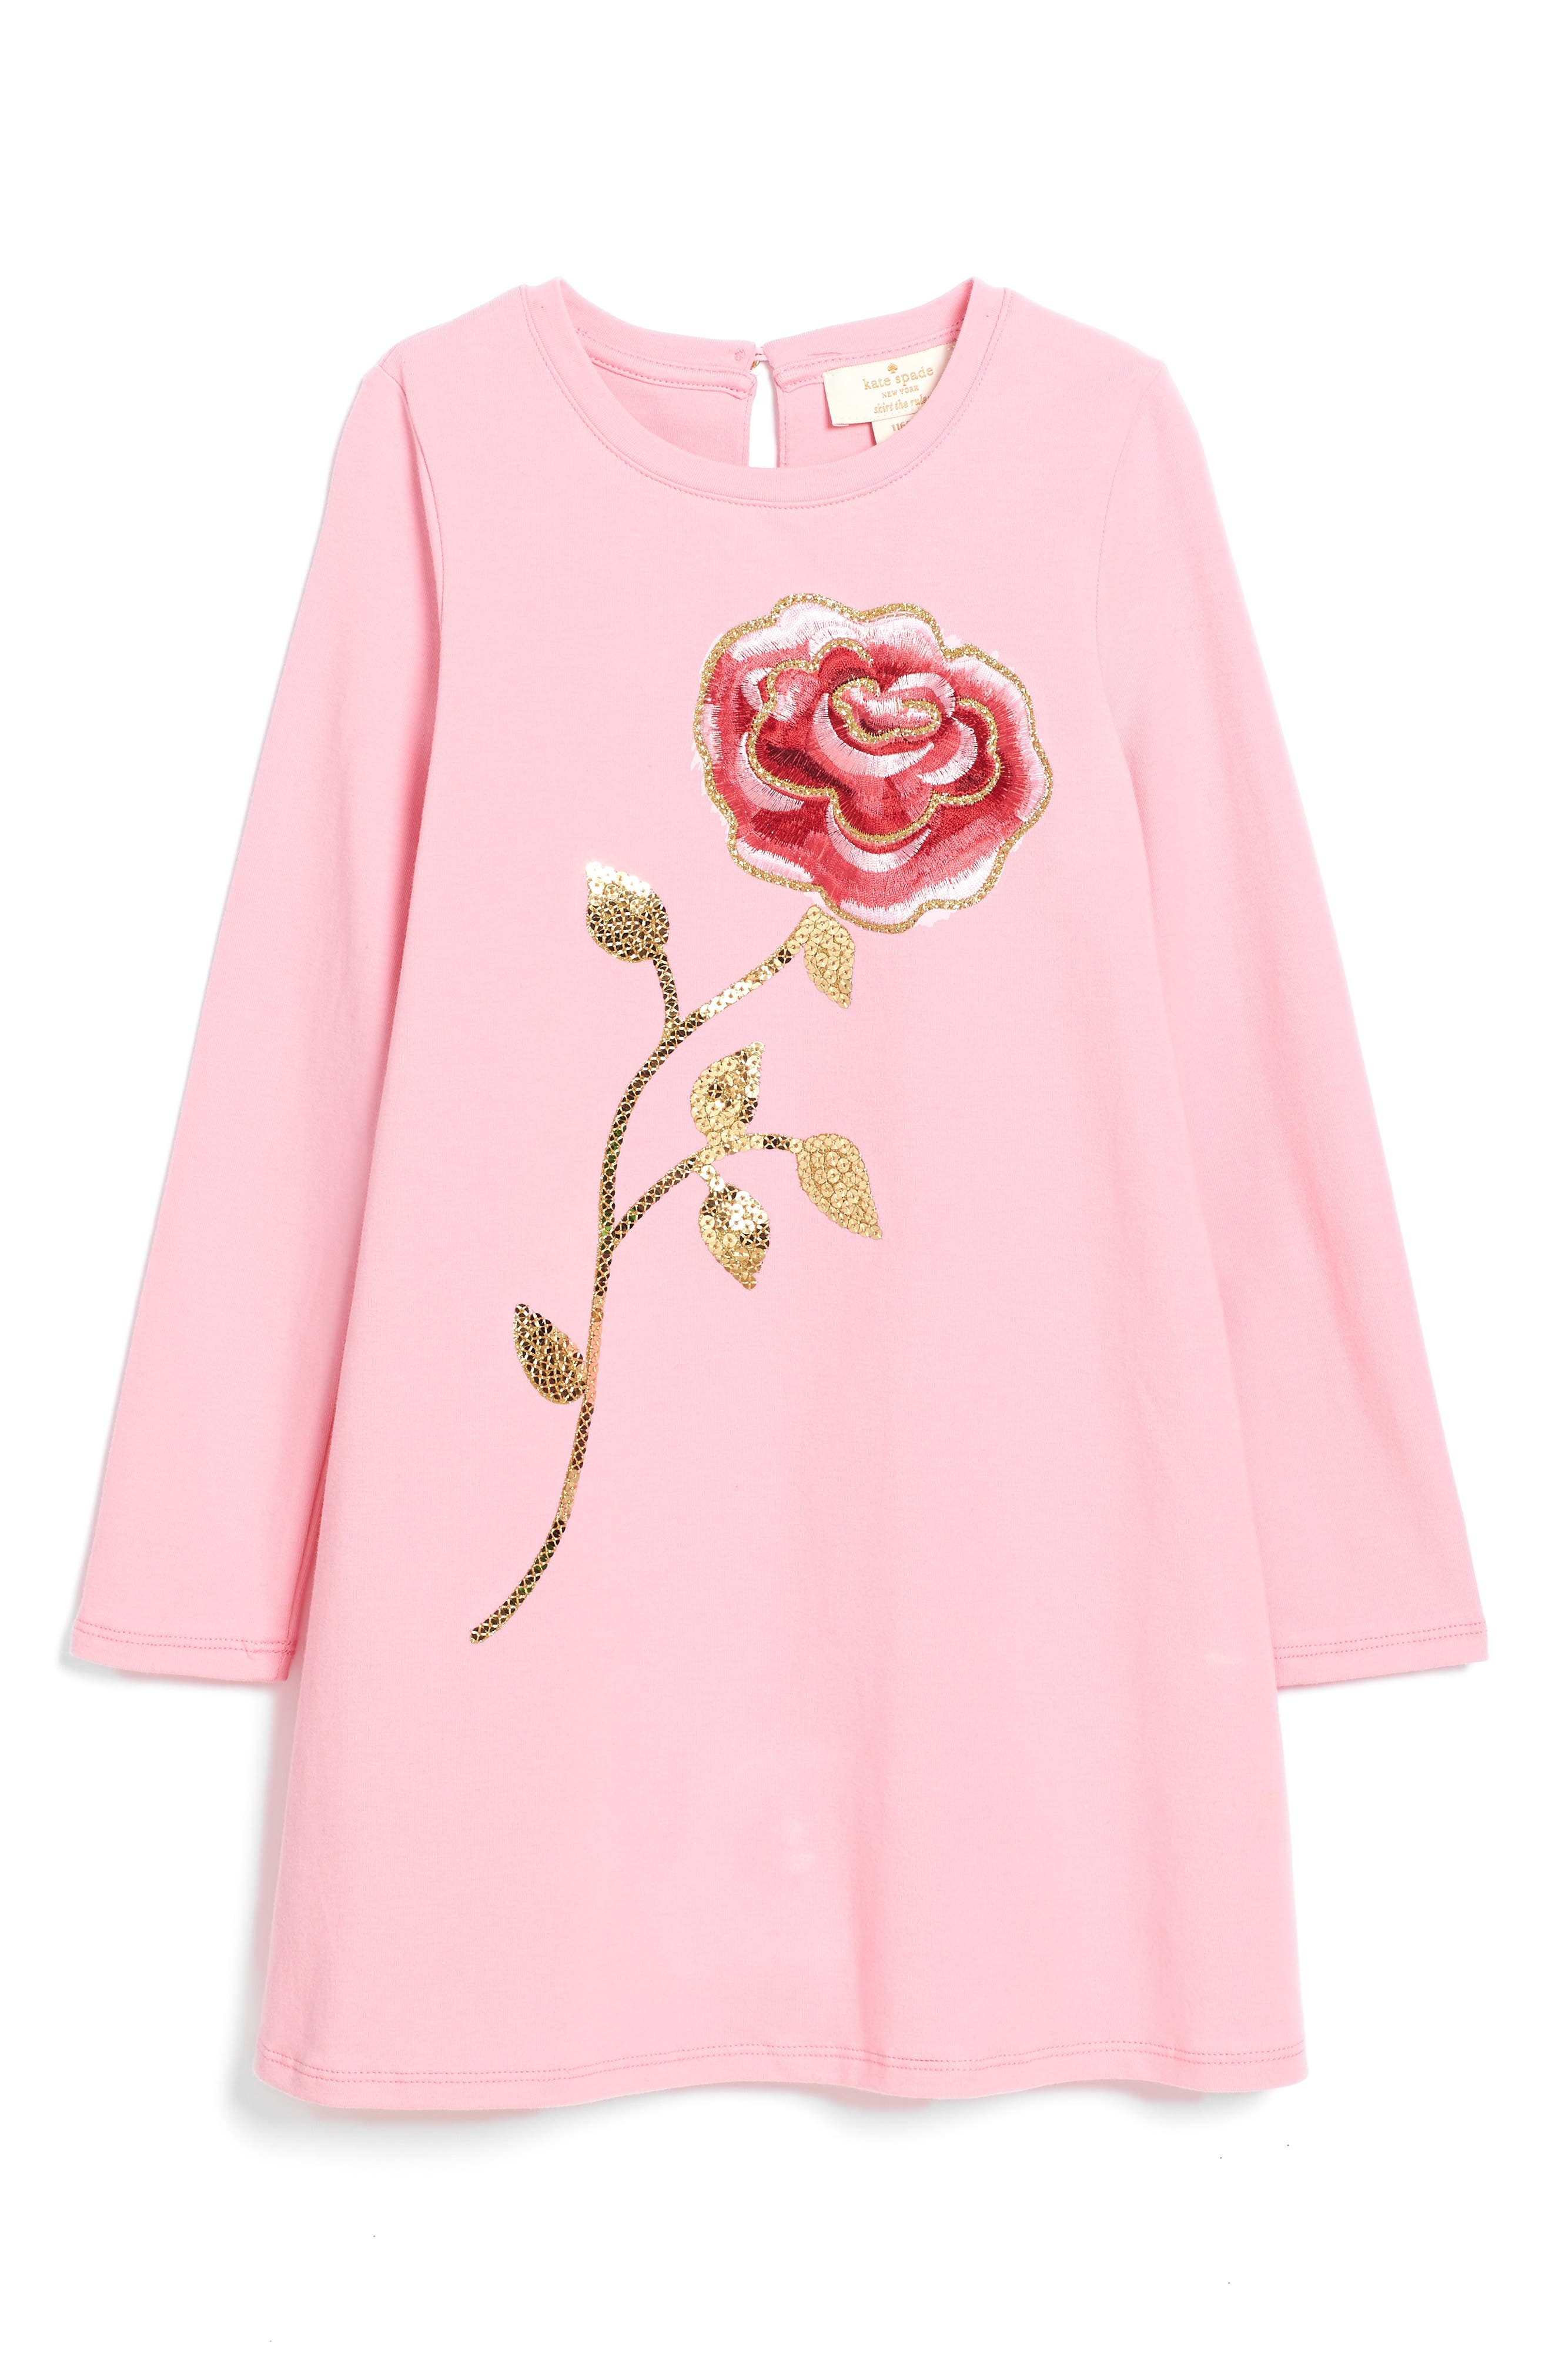 Main Image - kate spade new york rose dress (Big Girls)